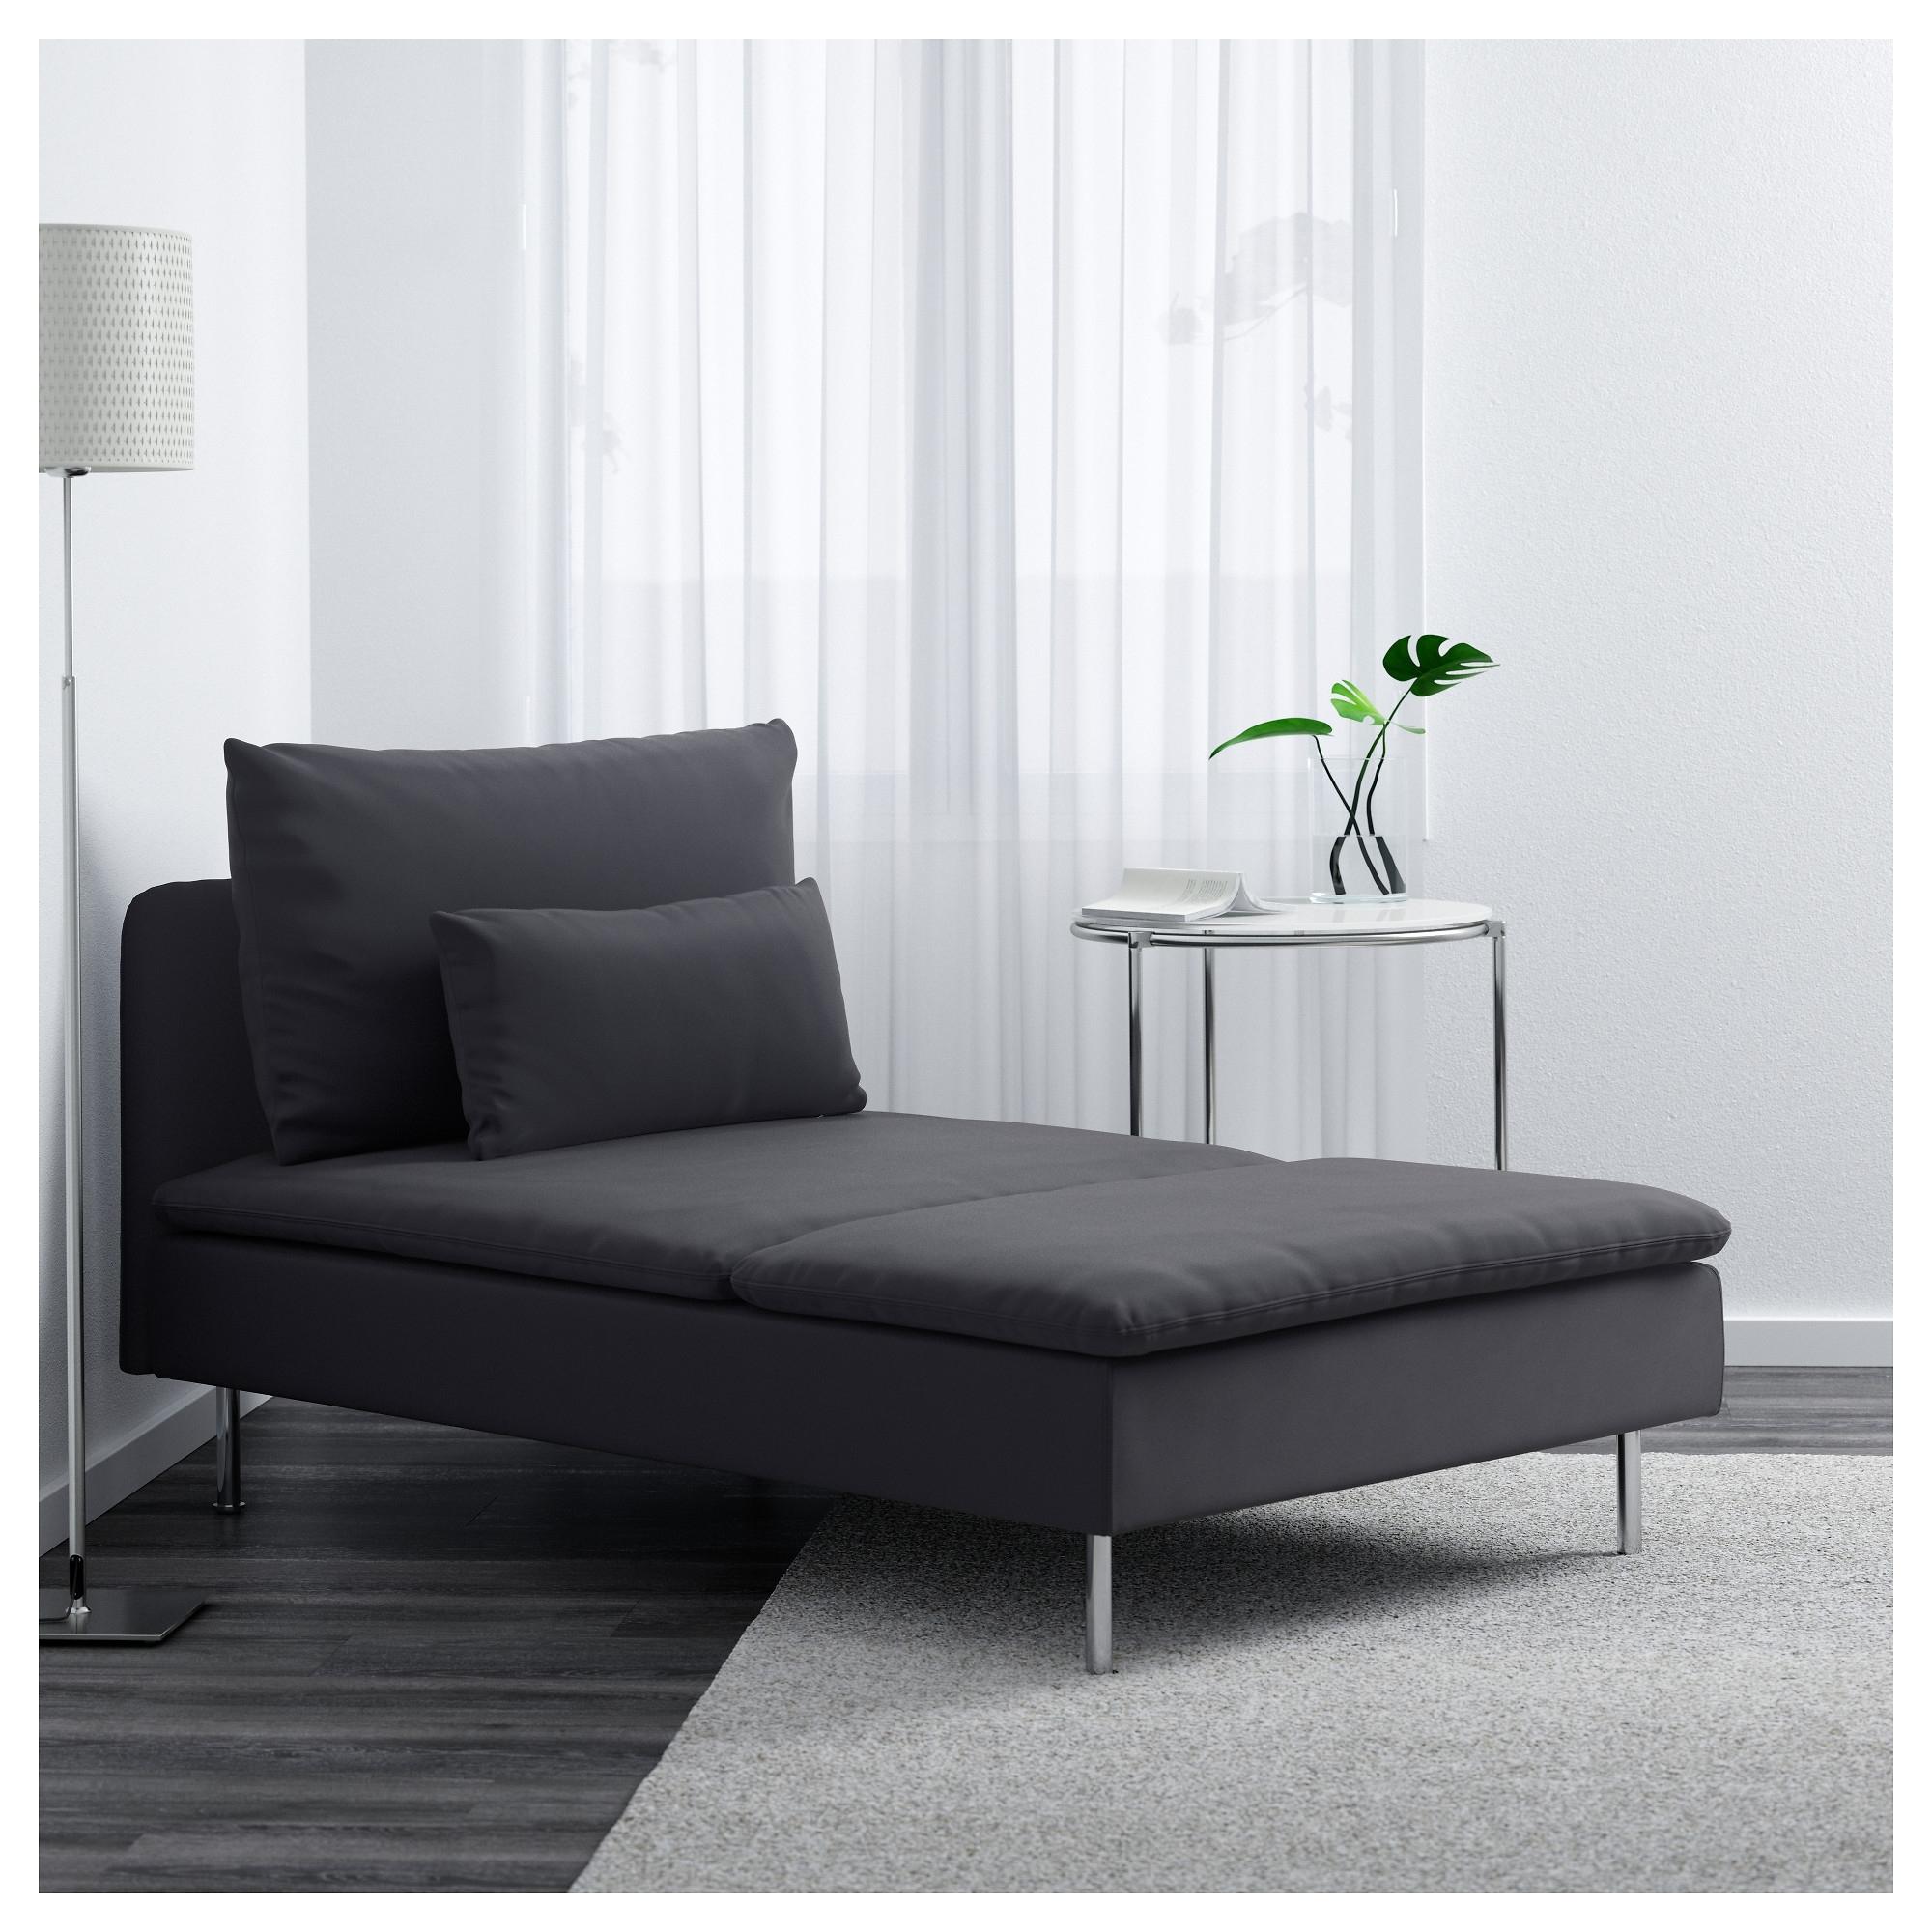 Gray Chaises In 2017 Söderhamn Chaise – Samsta Dark Gray – Ikea (View 7 of 15)